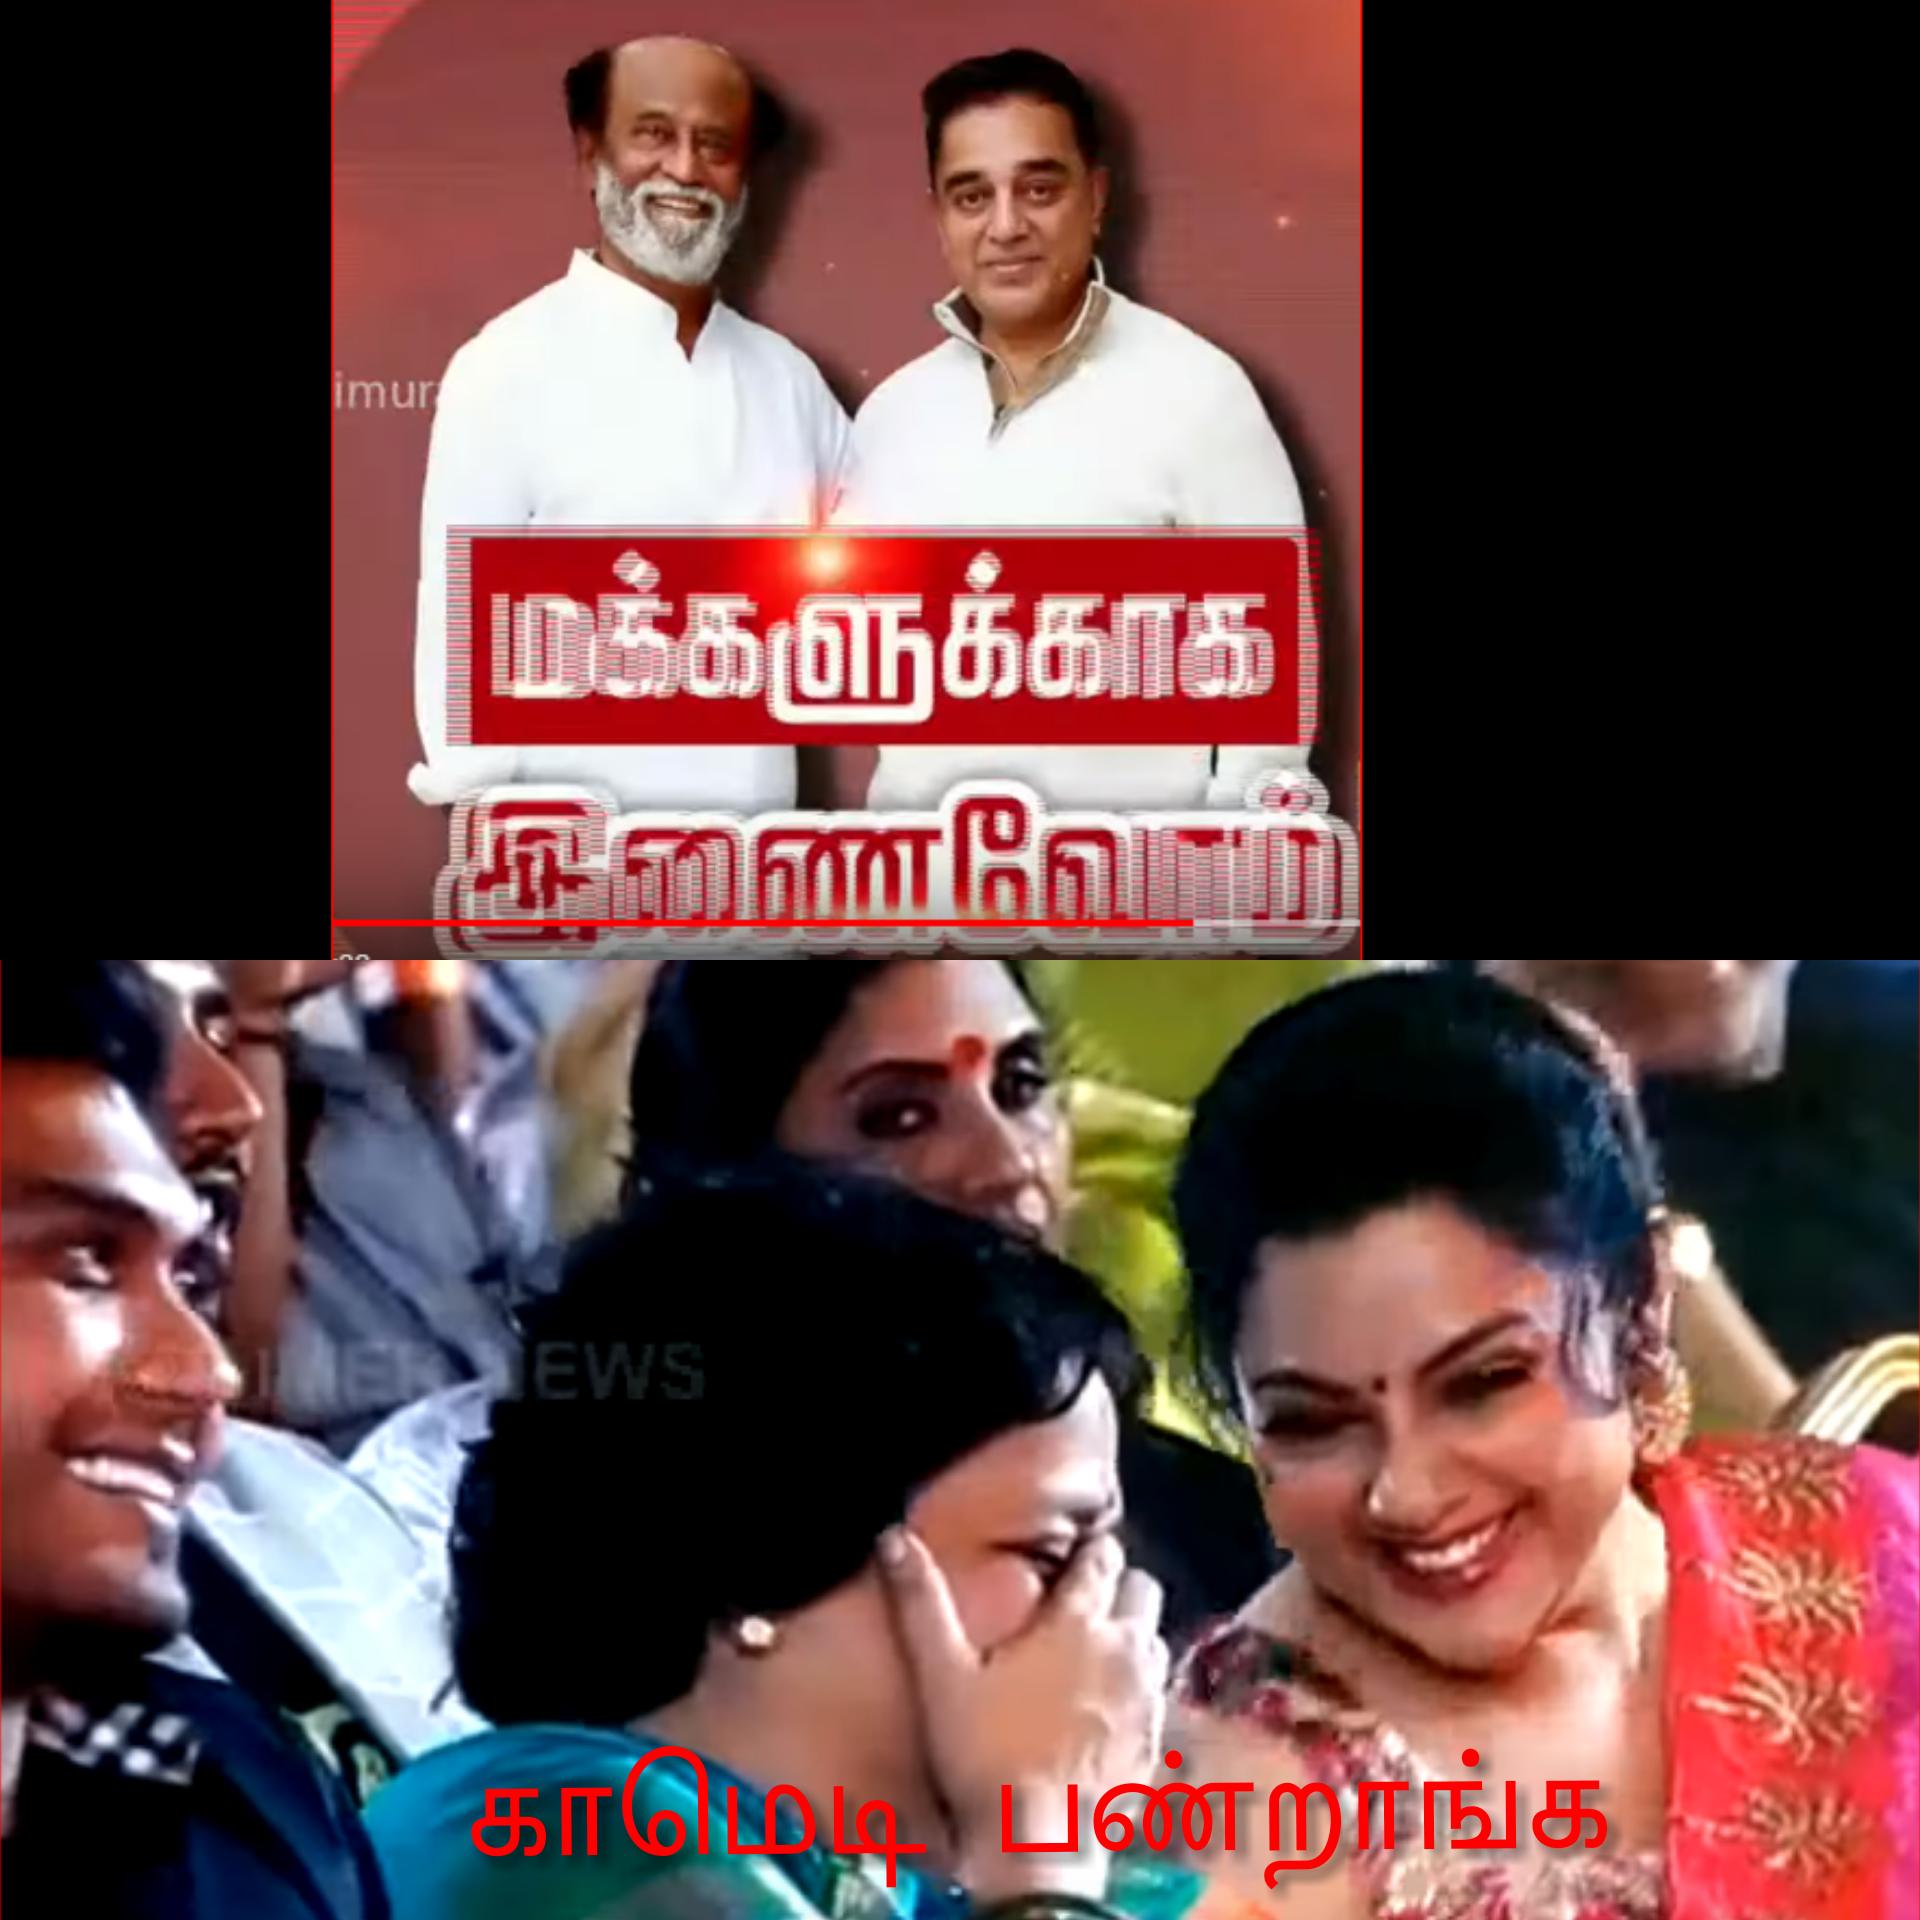 Rajinikanth kamal haasan politics meme template